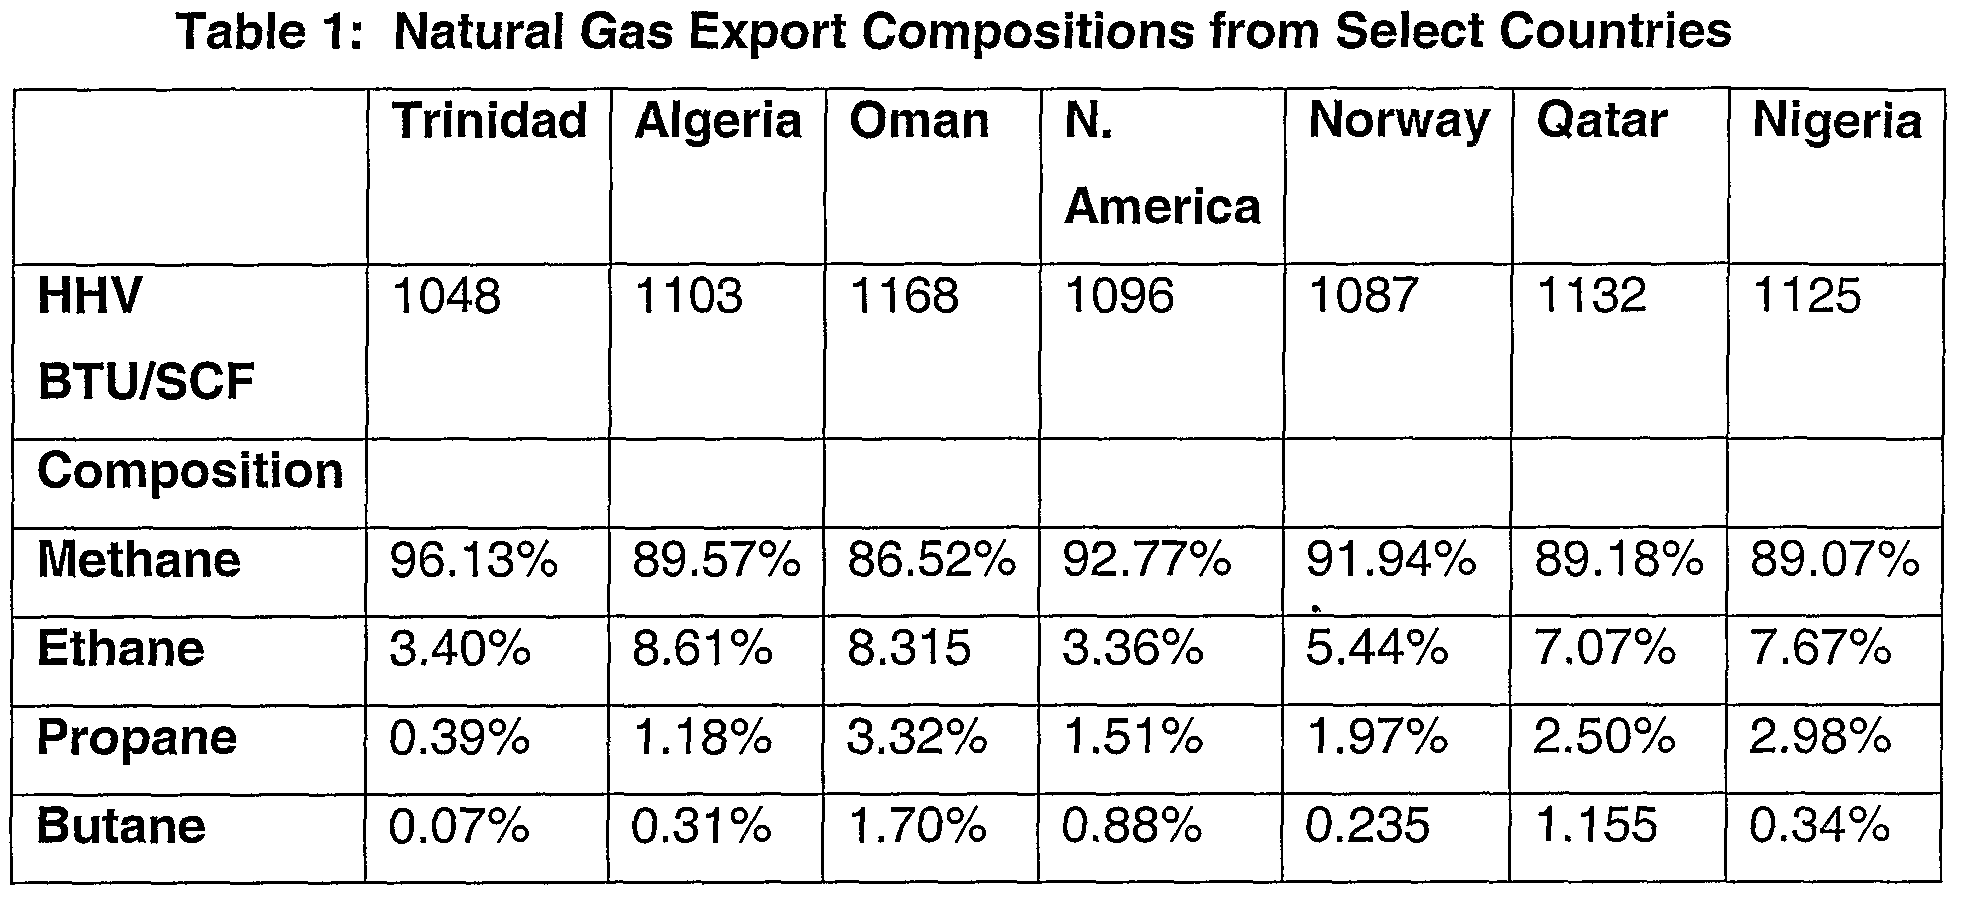 Heating Value Of Natural Gas At Btu Scf